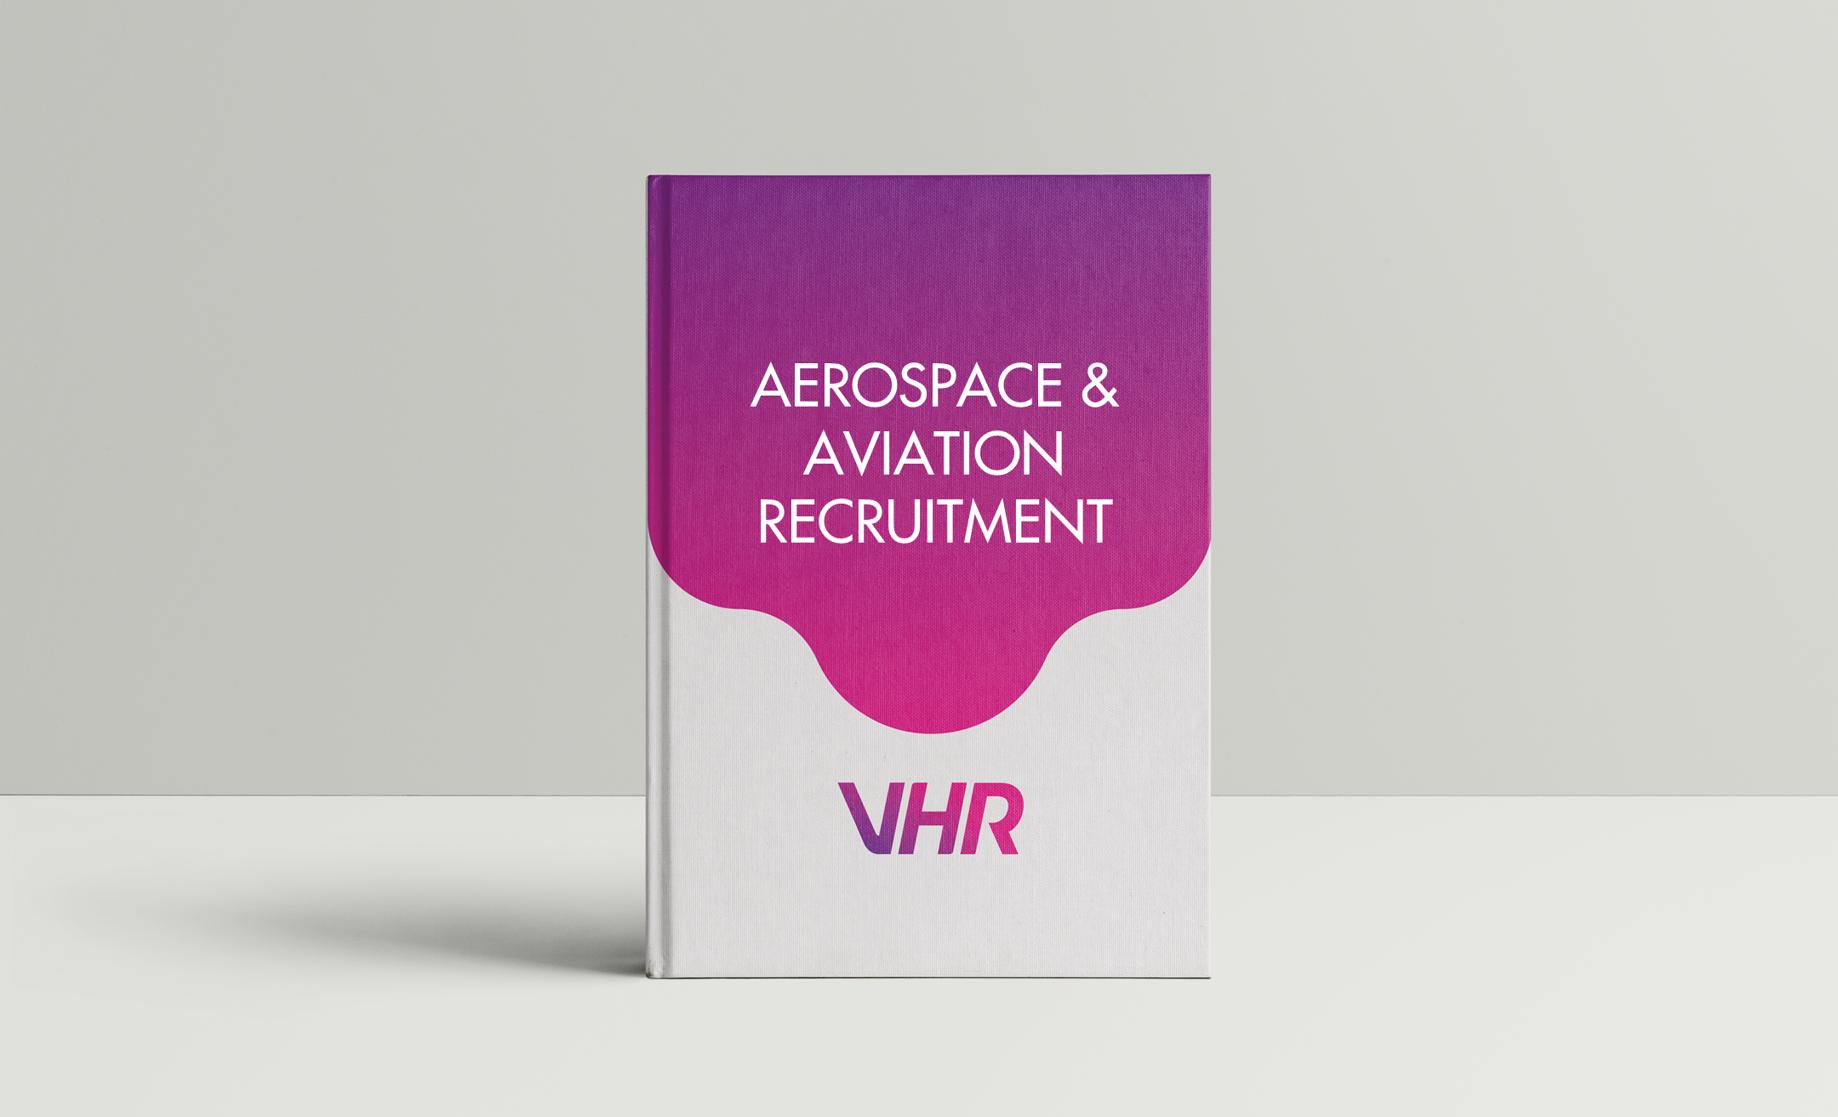 Aerospace & Aviation Recruitment Services Booklet